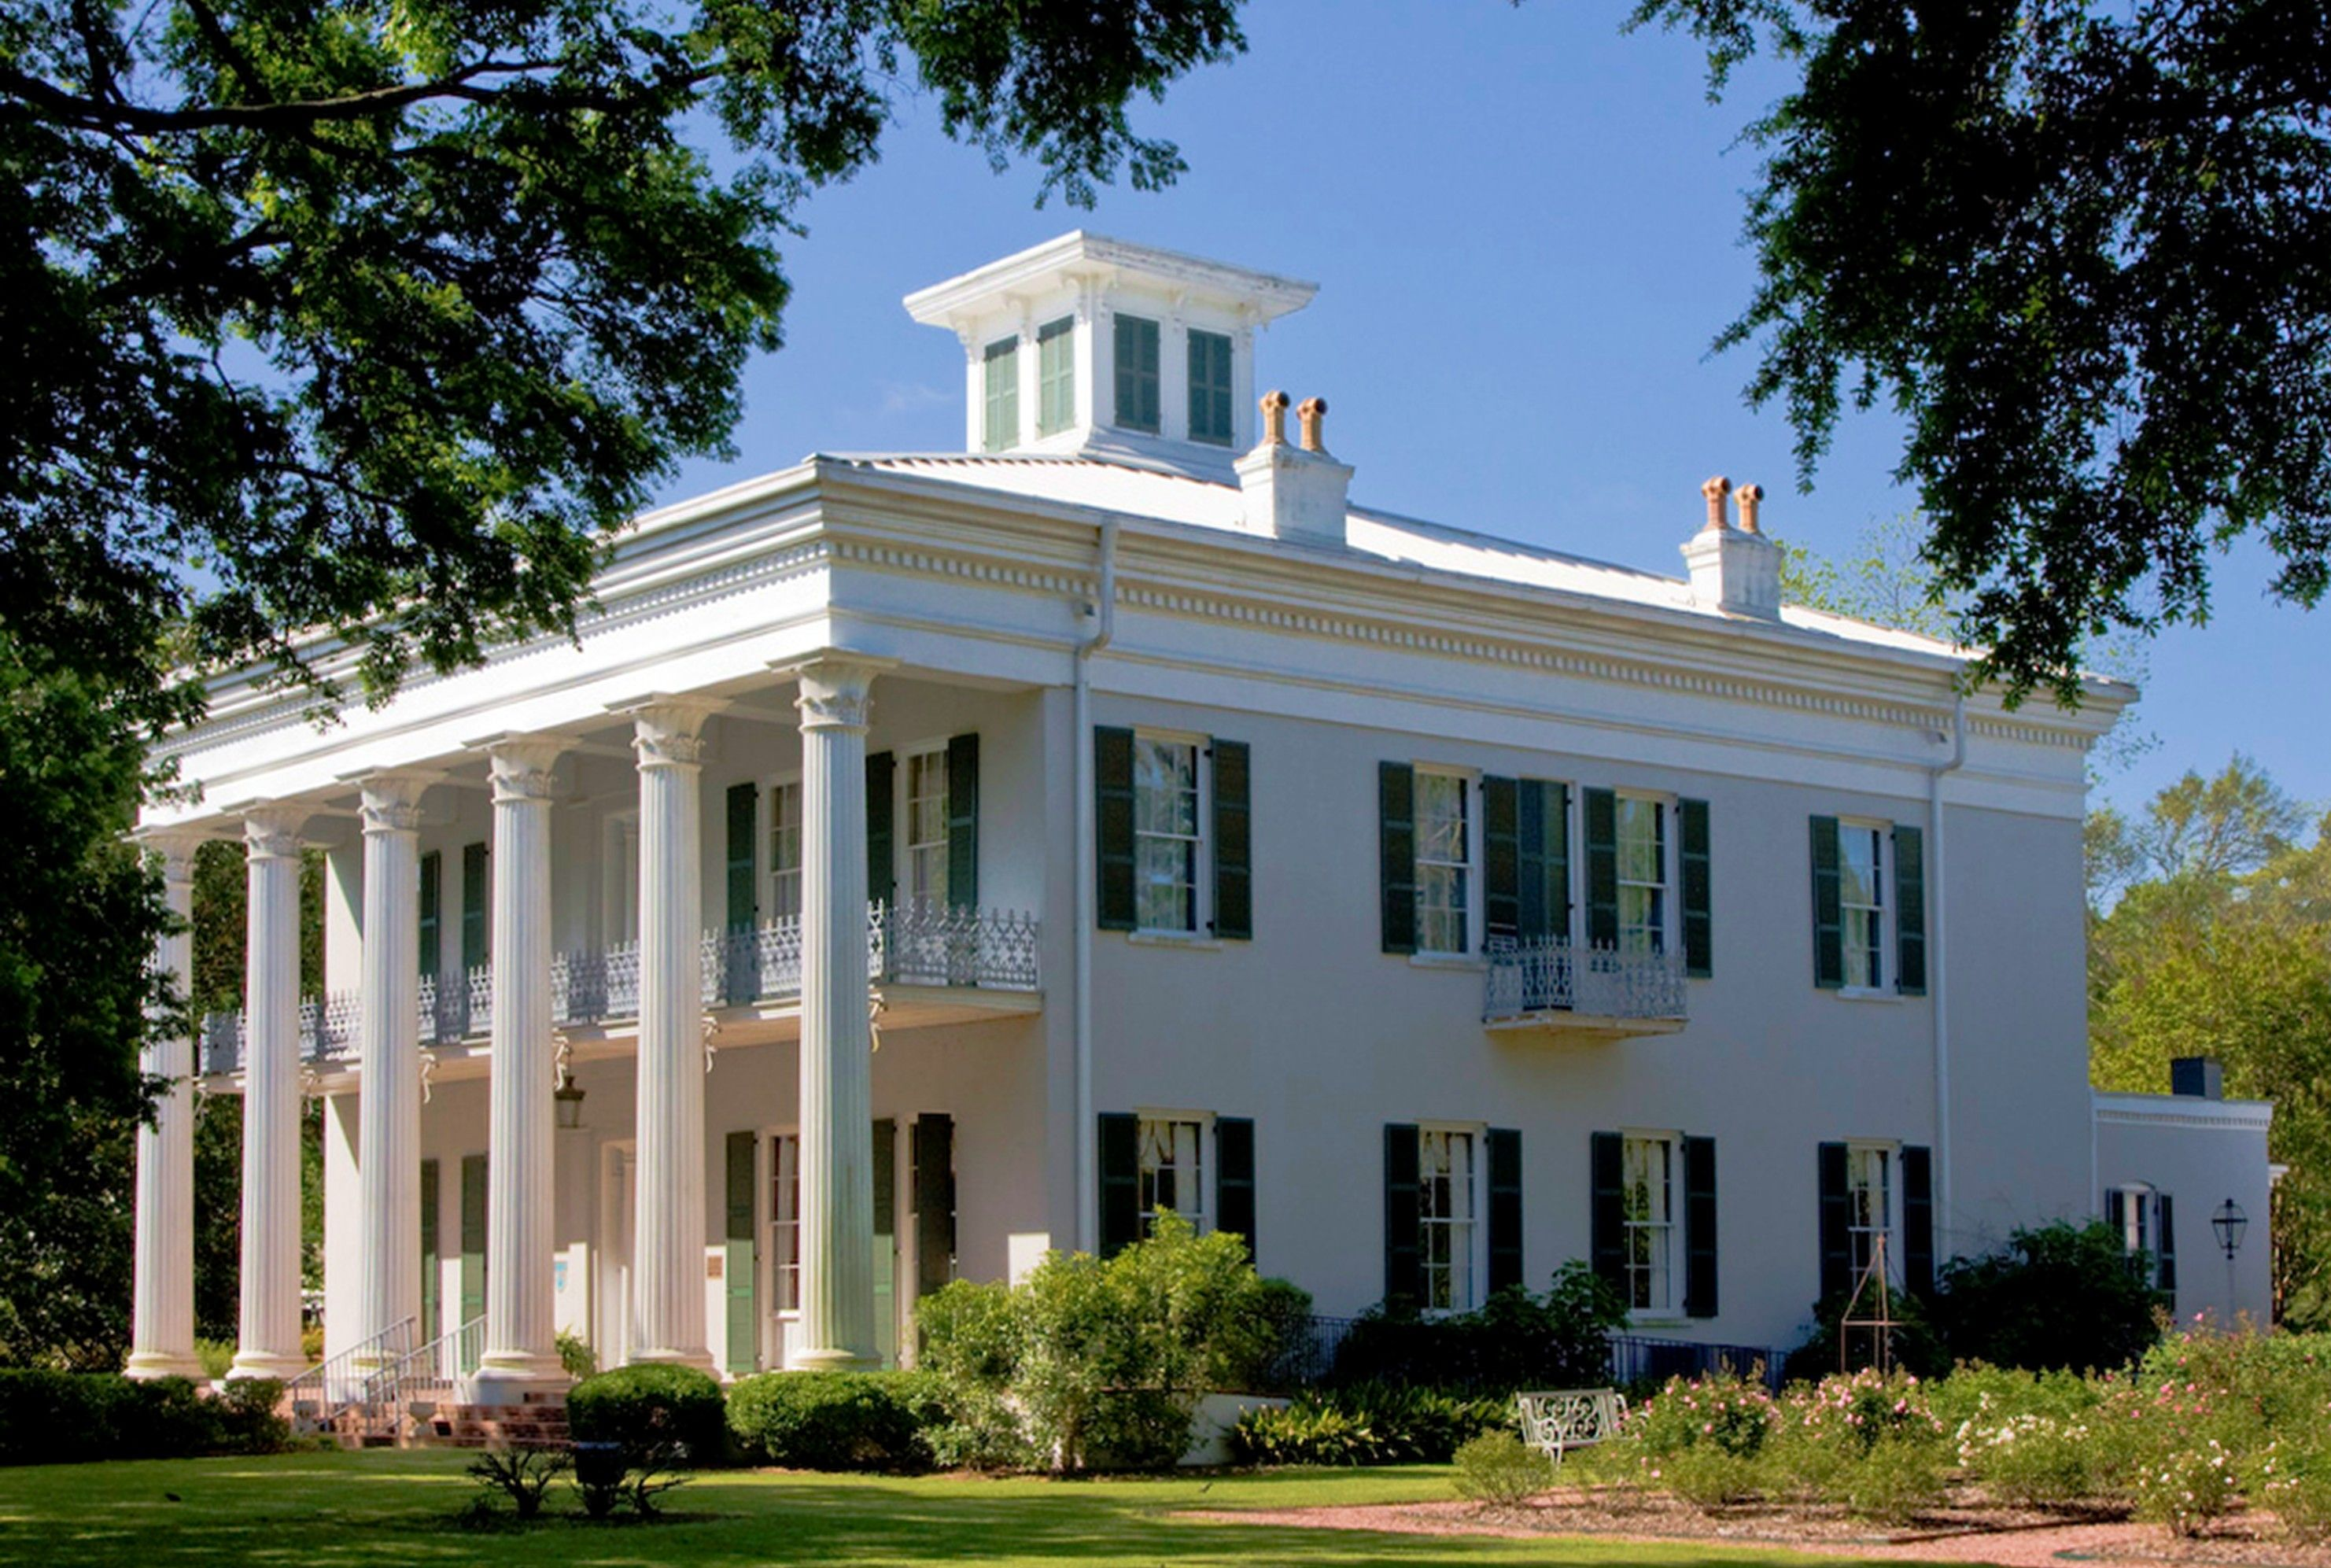 Watts-parkman-gillman Mansion . Sturdivant Hall Ca